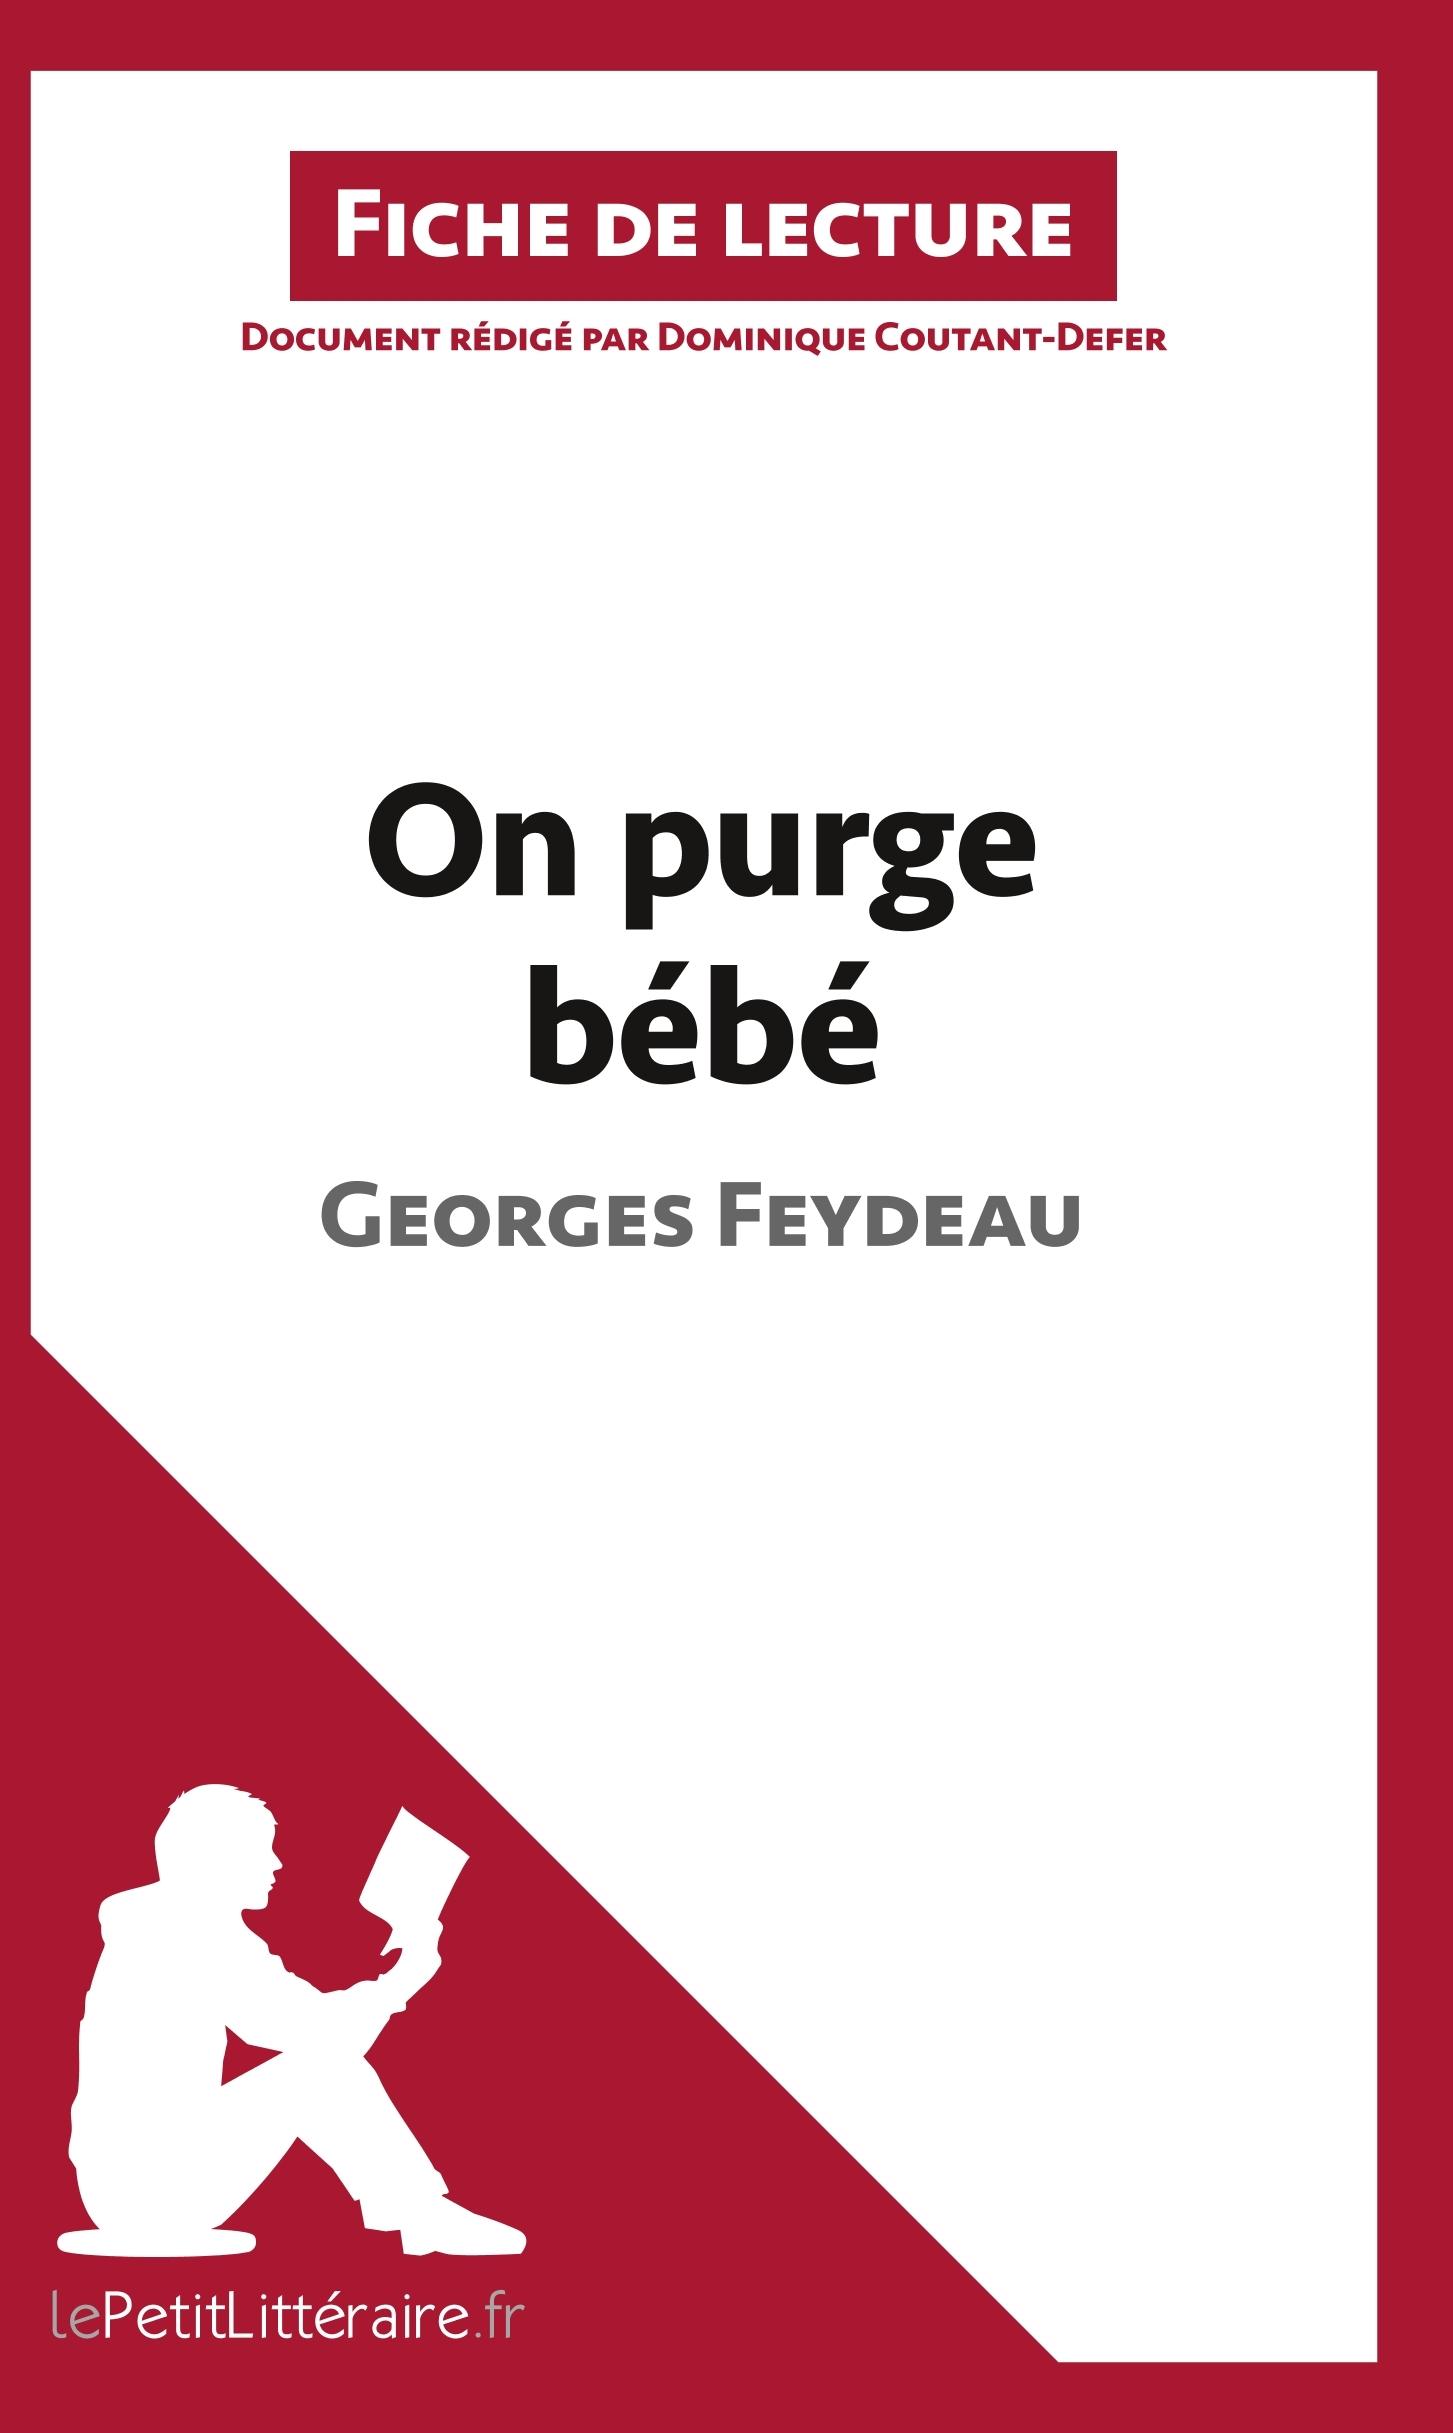 ANALYSE ON PURGE BEBE DE GEORGES FEYDEAU ANALYSE COMPLETE DE L UVRE ET RESUME